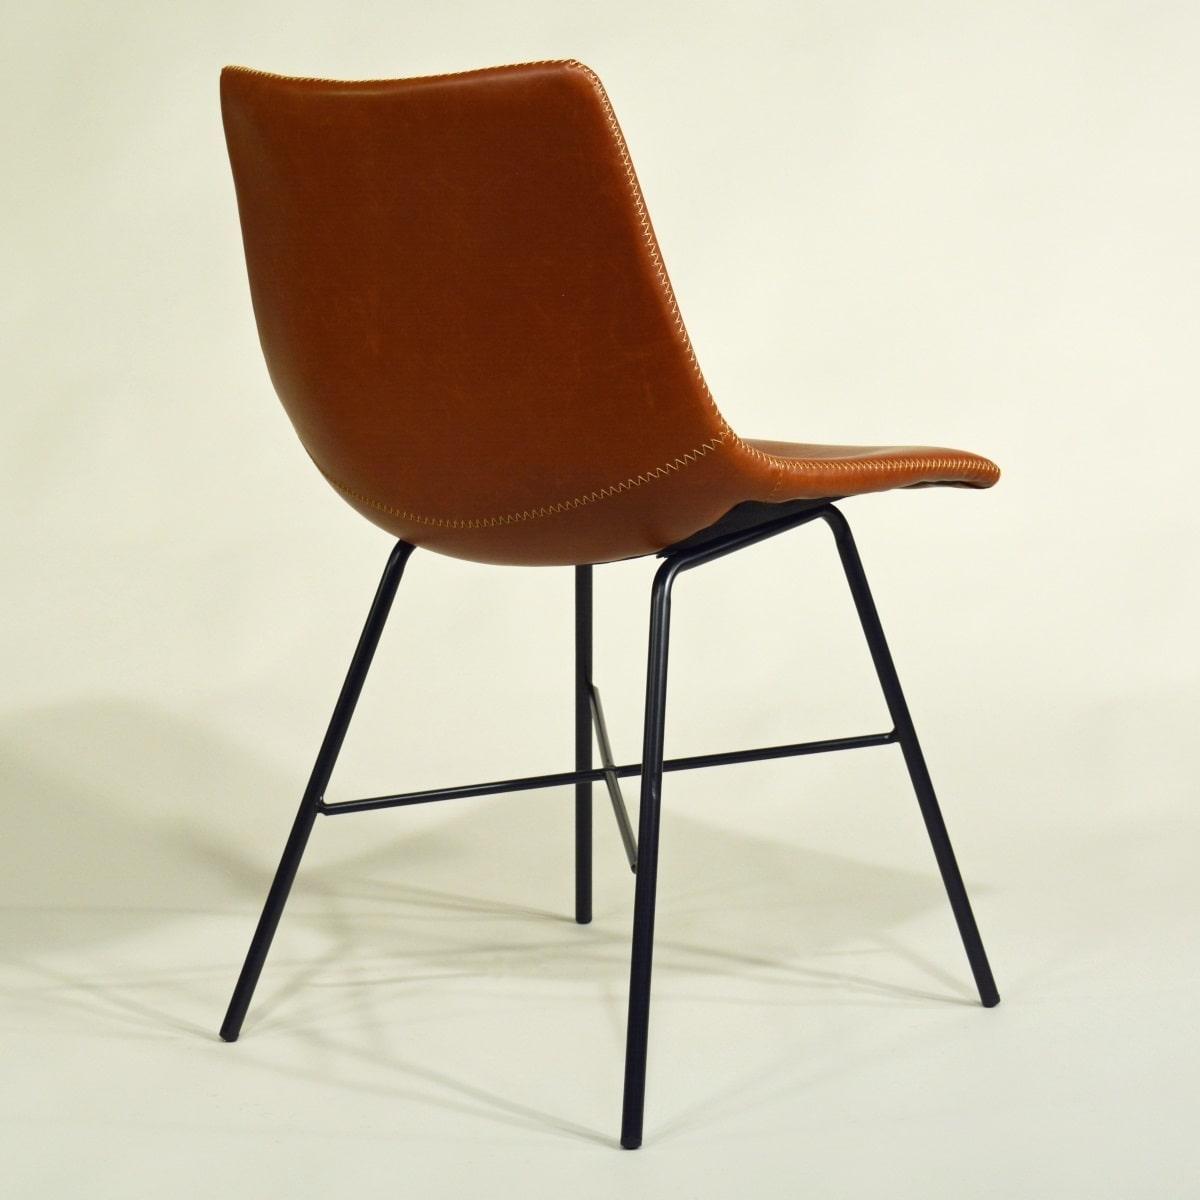 Braner Stuhl gepolstert Metallgestell schwarz